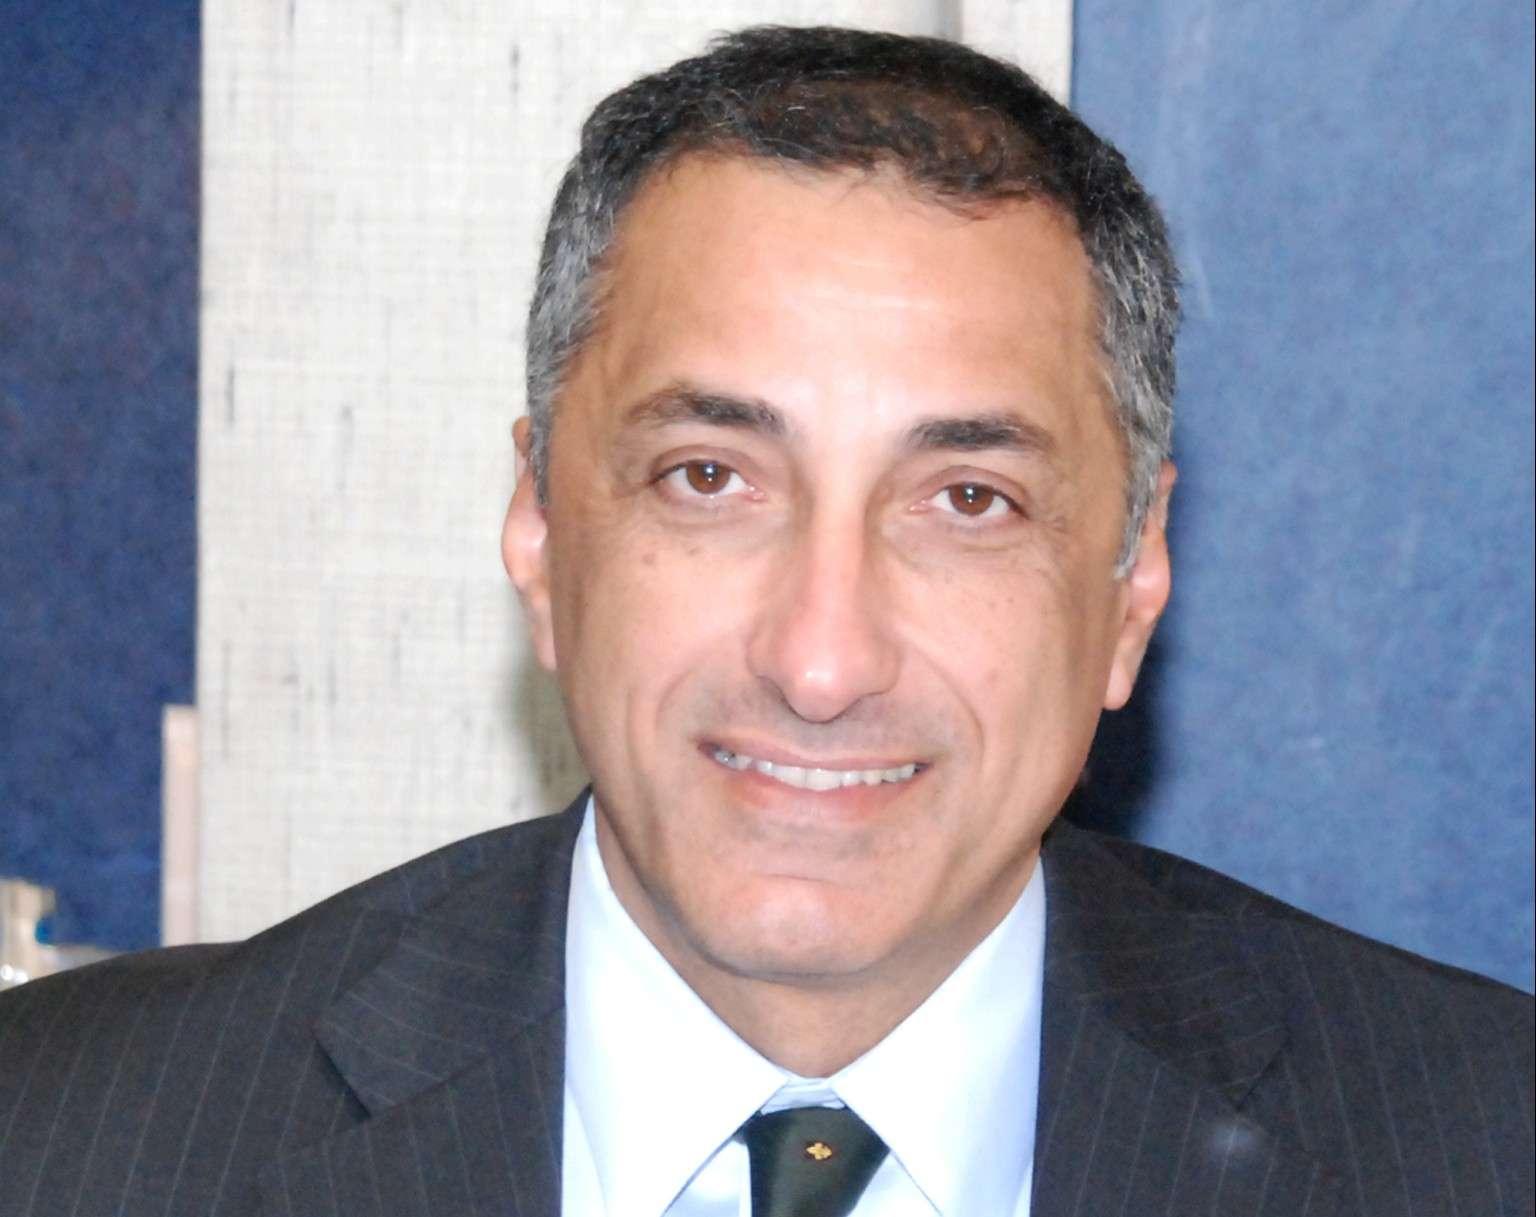 cbe governor tarek amer term